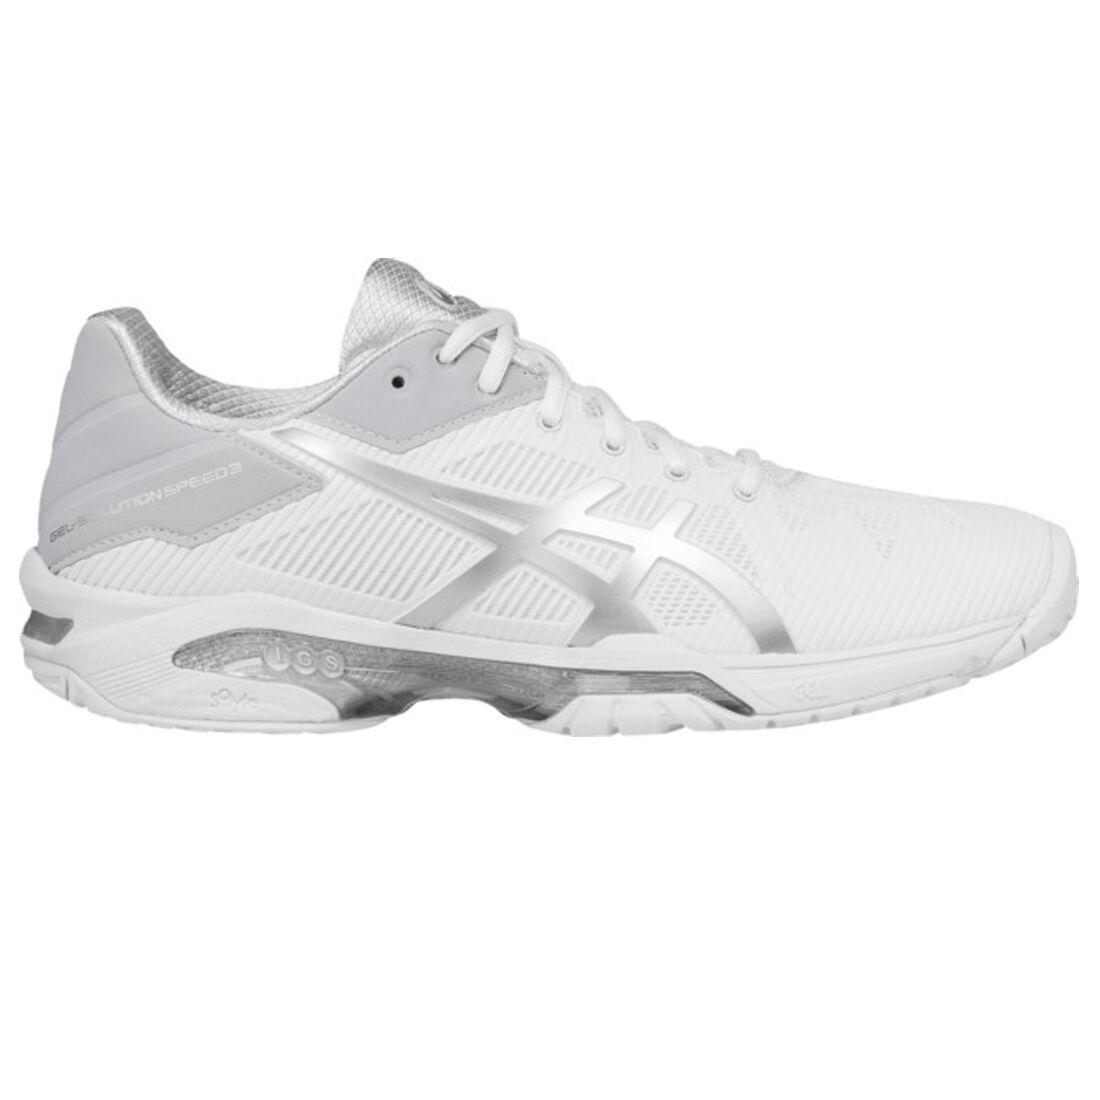 Asics GEL Solution Speed 3 Women's Tennis Shoe WhiteSilver